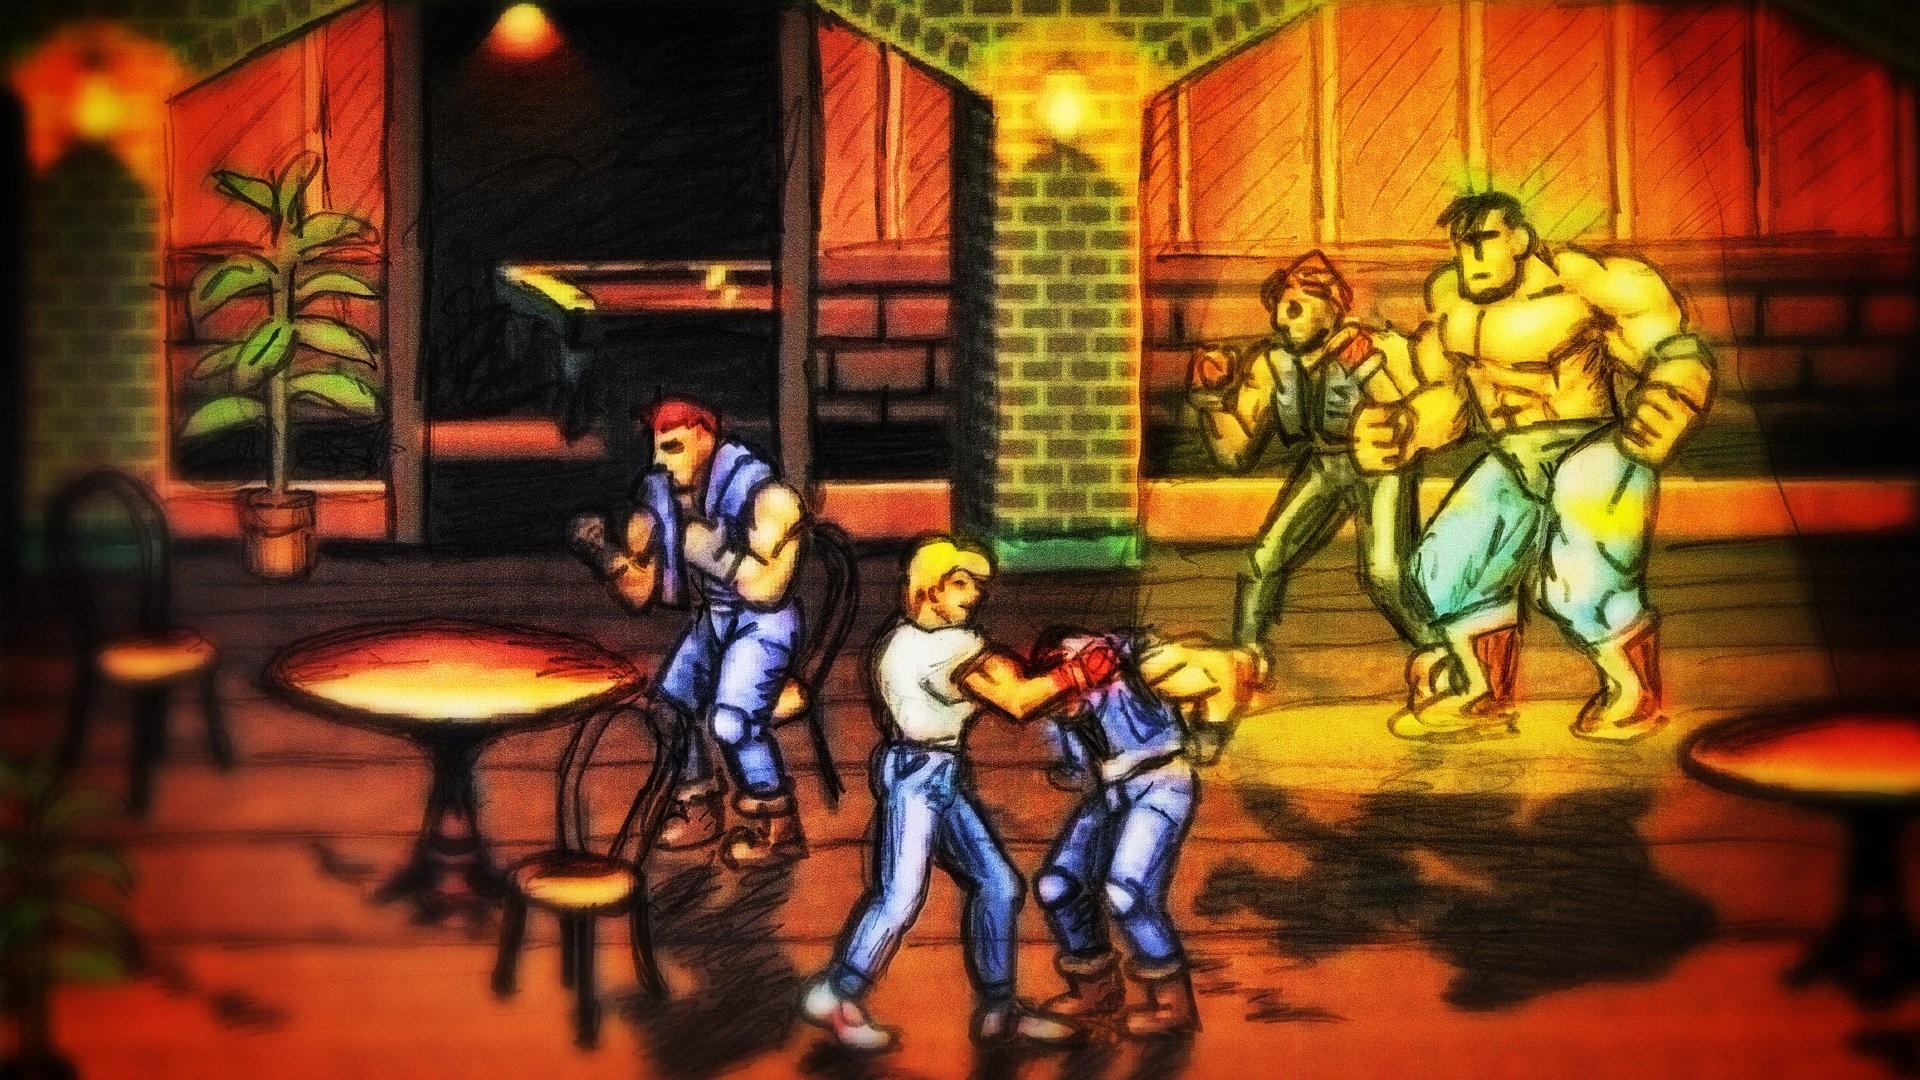 STREETS Of RAGE Ikari no Tekken action fighting arena scrolling wrestling  boxing martial 1sor nintendo sega wallpaper | | 626217 |  WallpaperUP